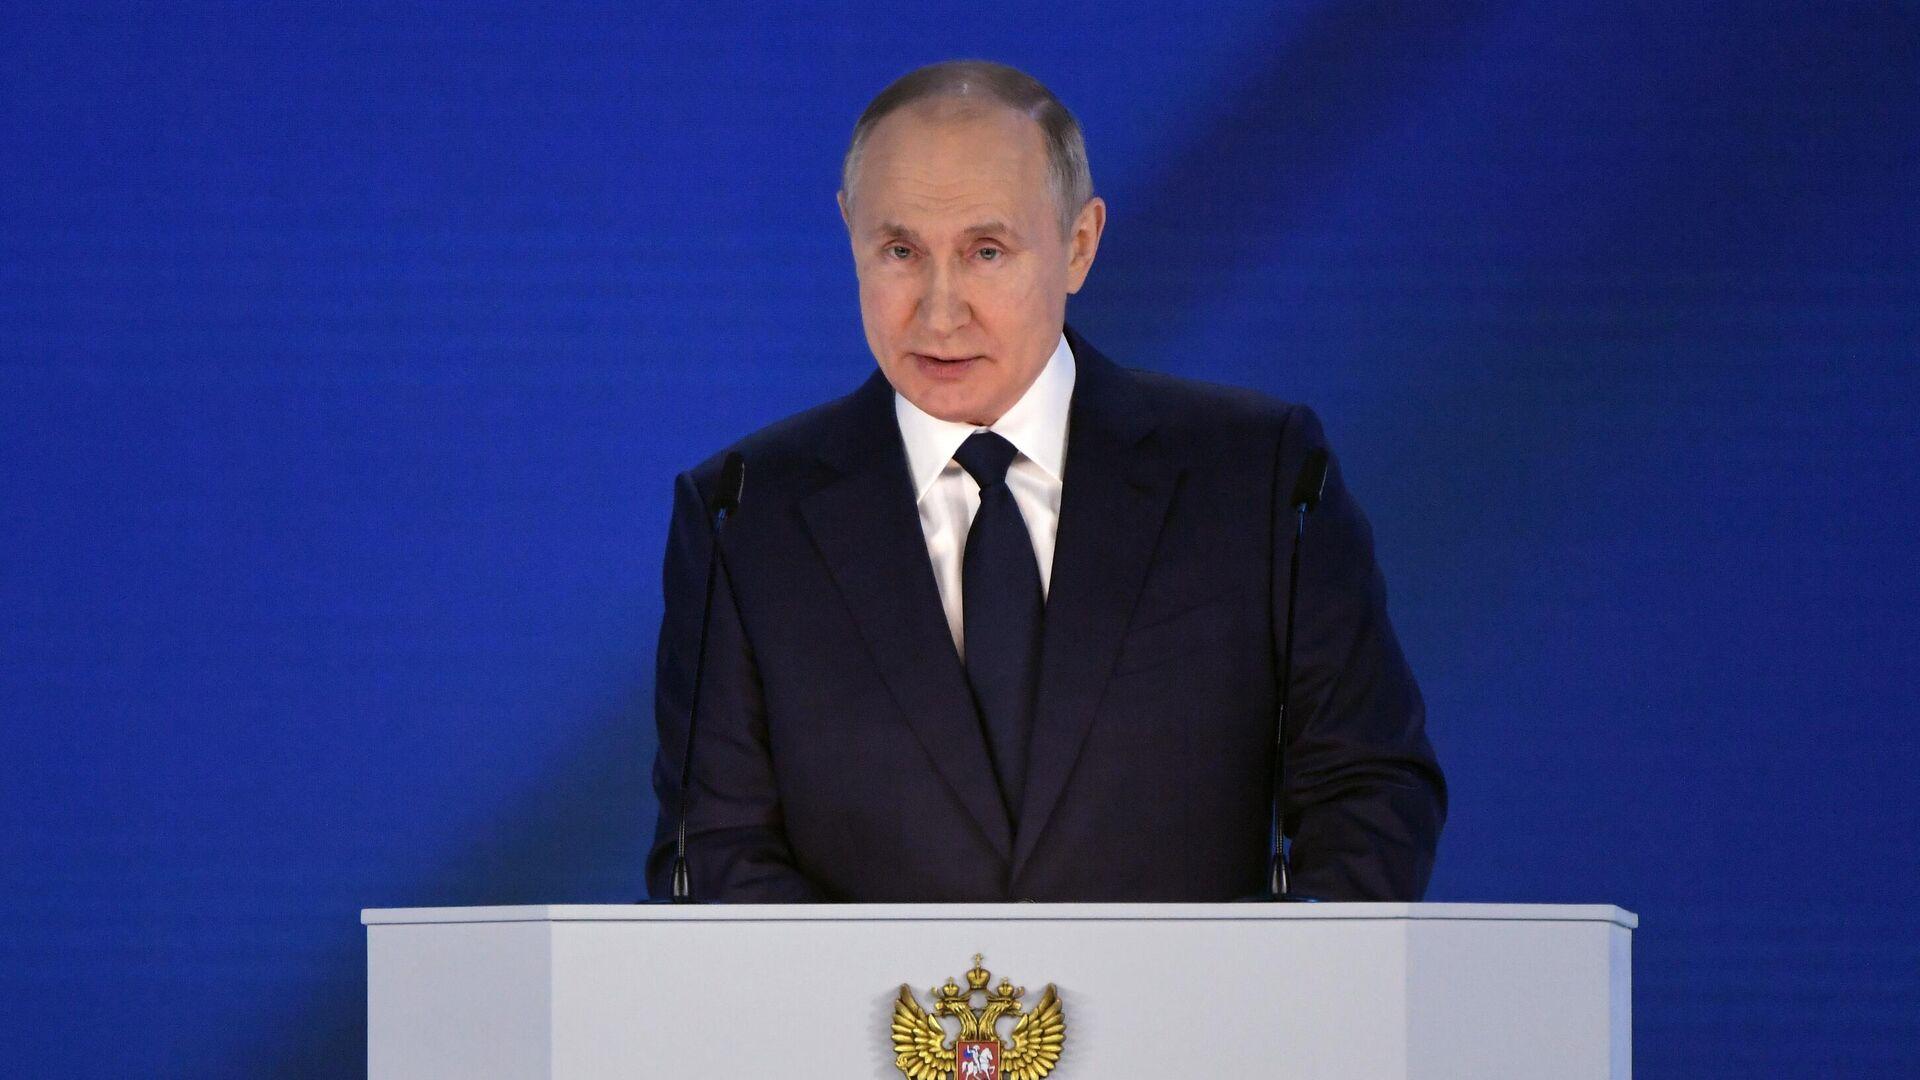 El presidente ruso, Vladímir Putin - Sputnik Mundo, 1920, 23.06.2021